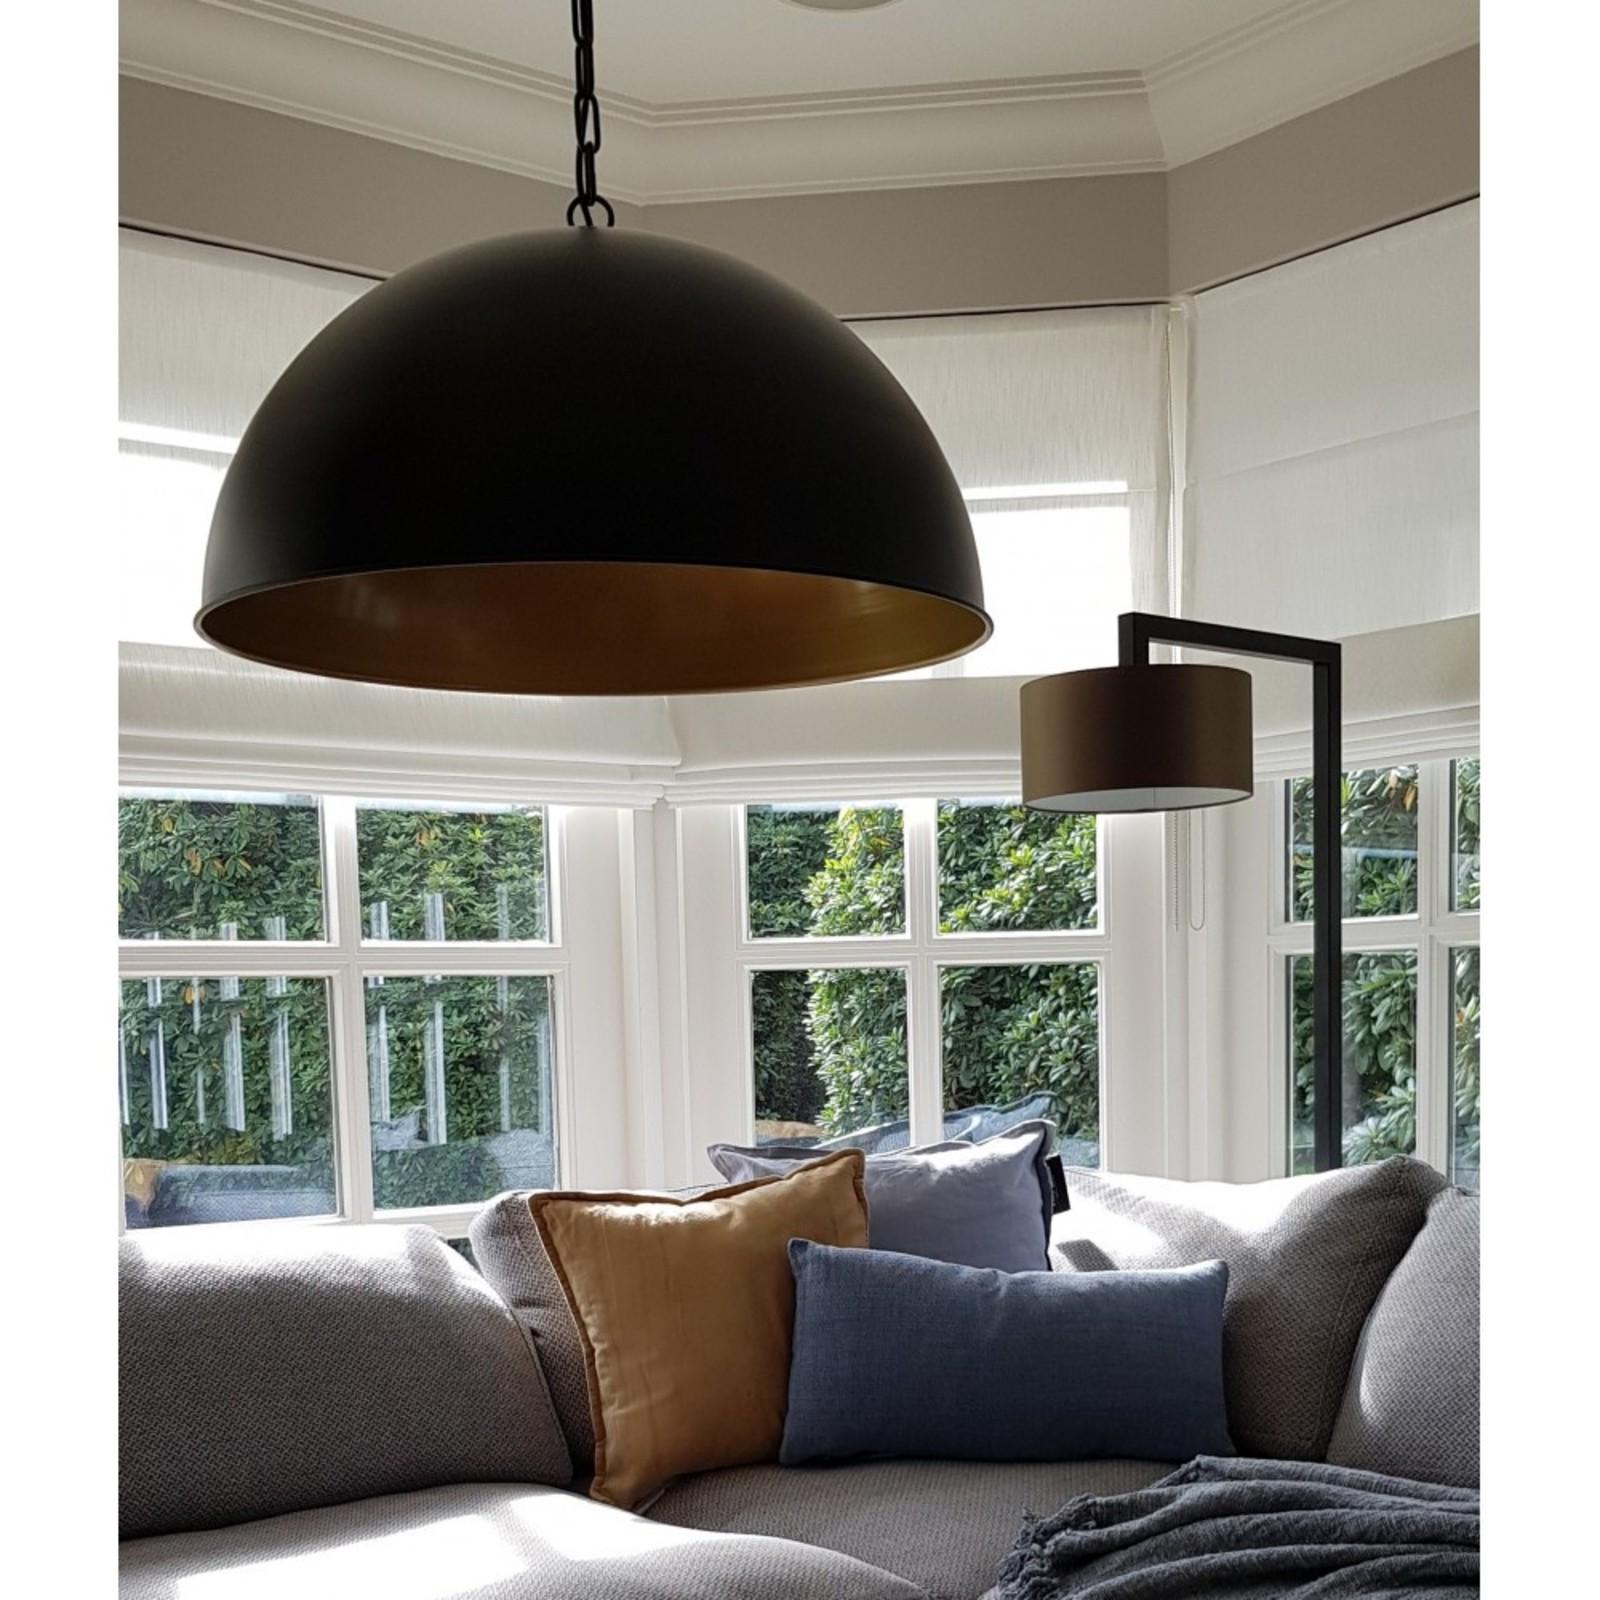 Luksa hanglamp Femke zwart met goud 60 cm